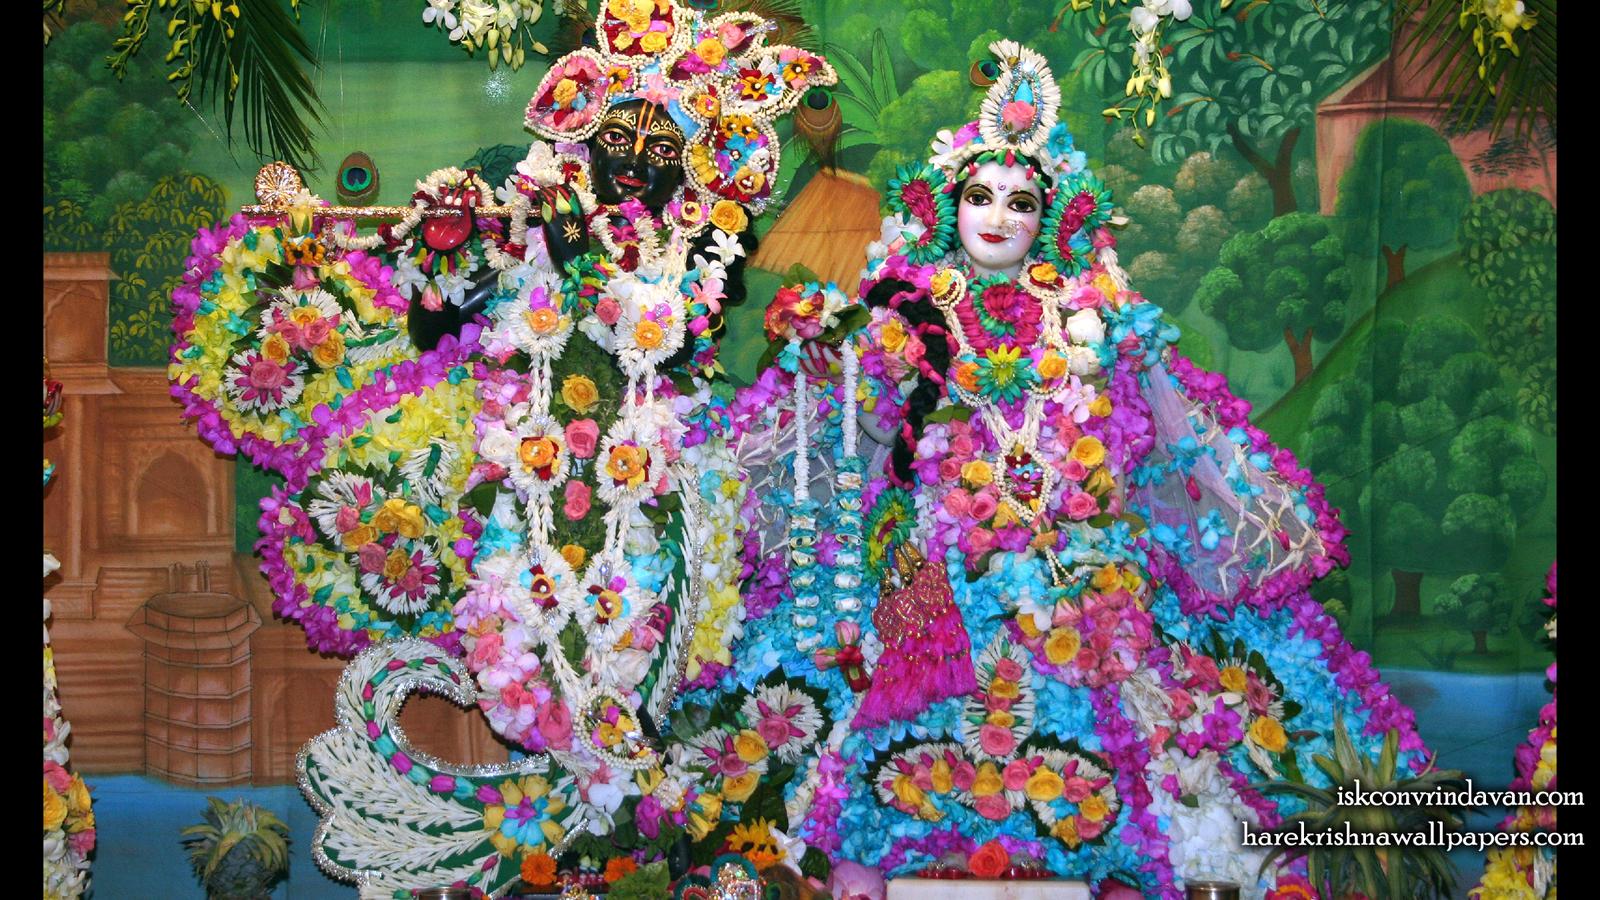 Sri Sri Radha Shyamsundar Wallpaper (007) Size 1600x900 Download